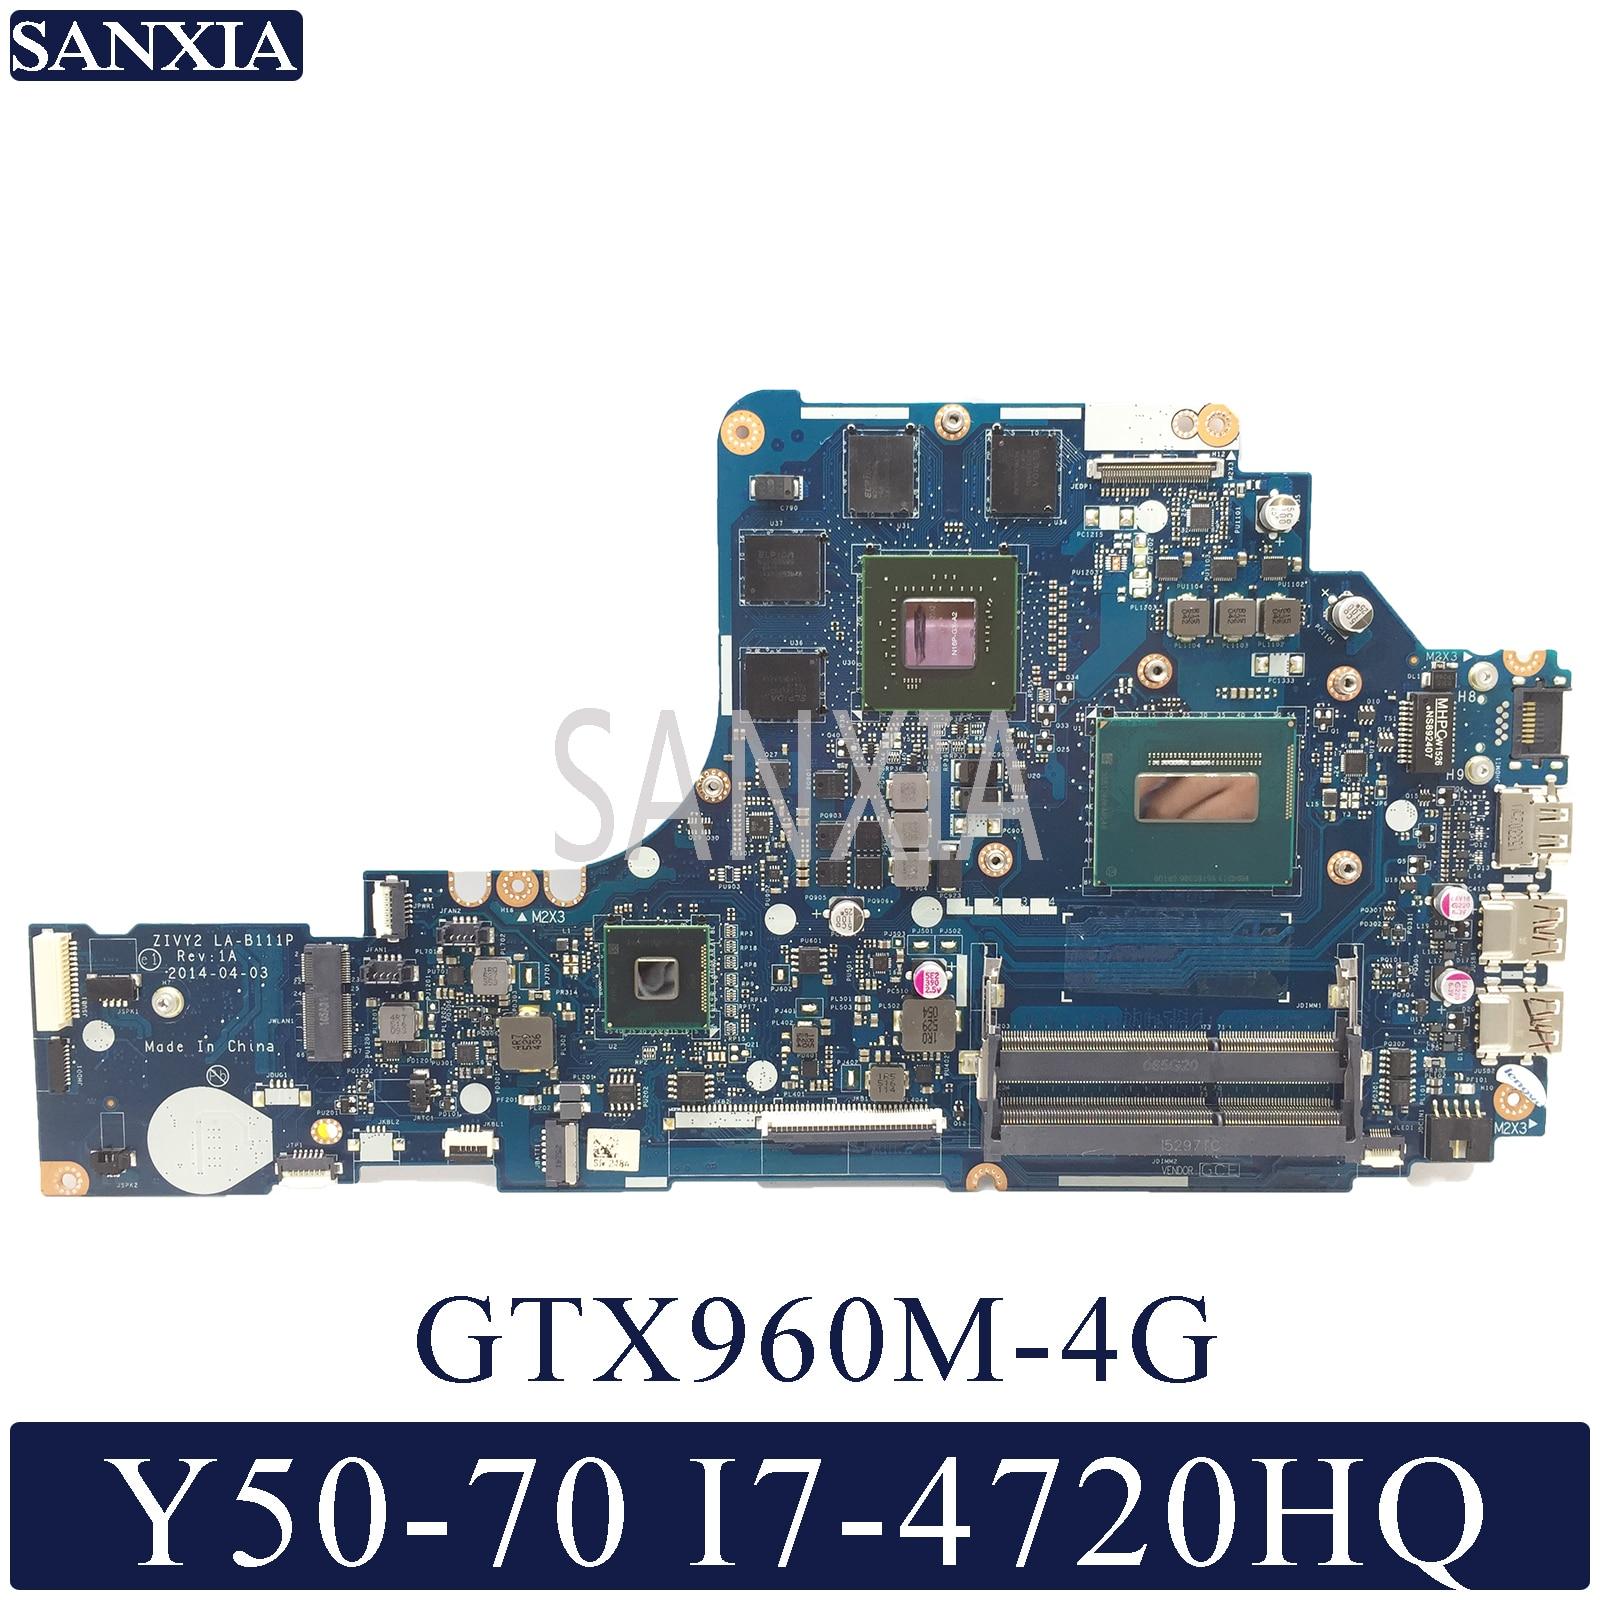 KEFU LA B111P Laptop motherboard for Lenovo Y50 70 original mainboard I7 4720HQ 4710HQ GTX960M 4G